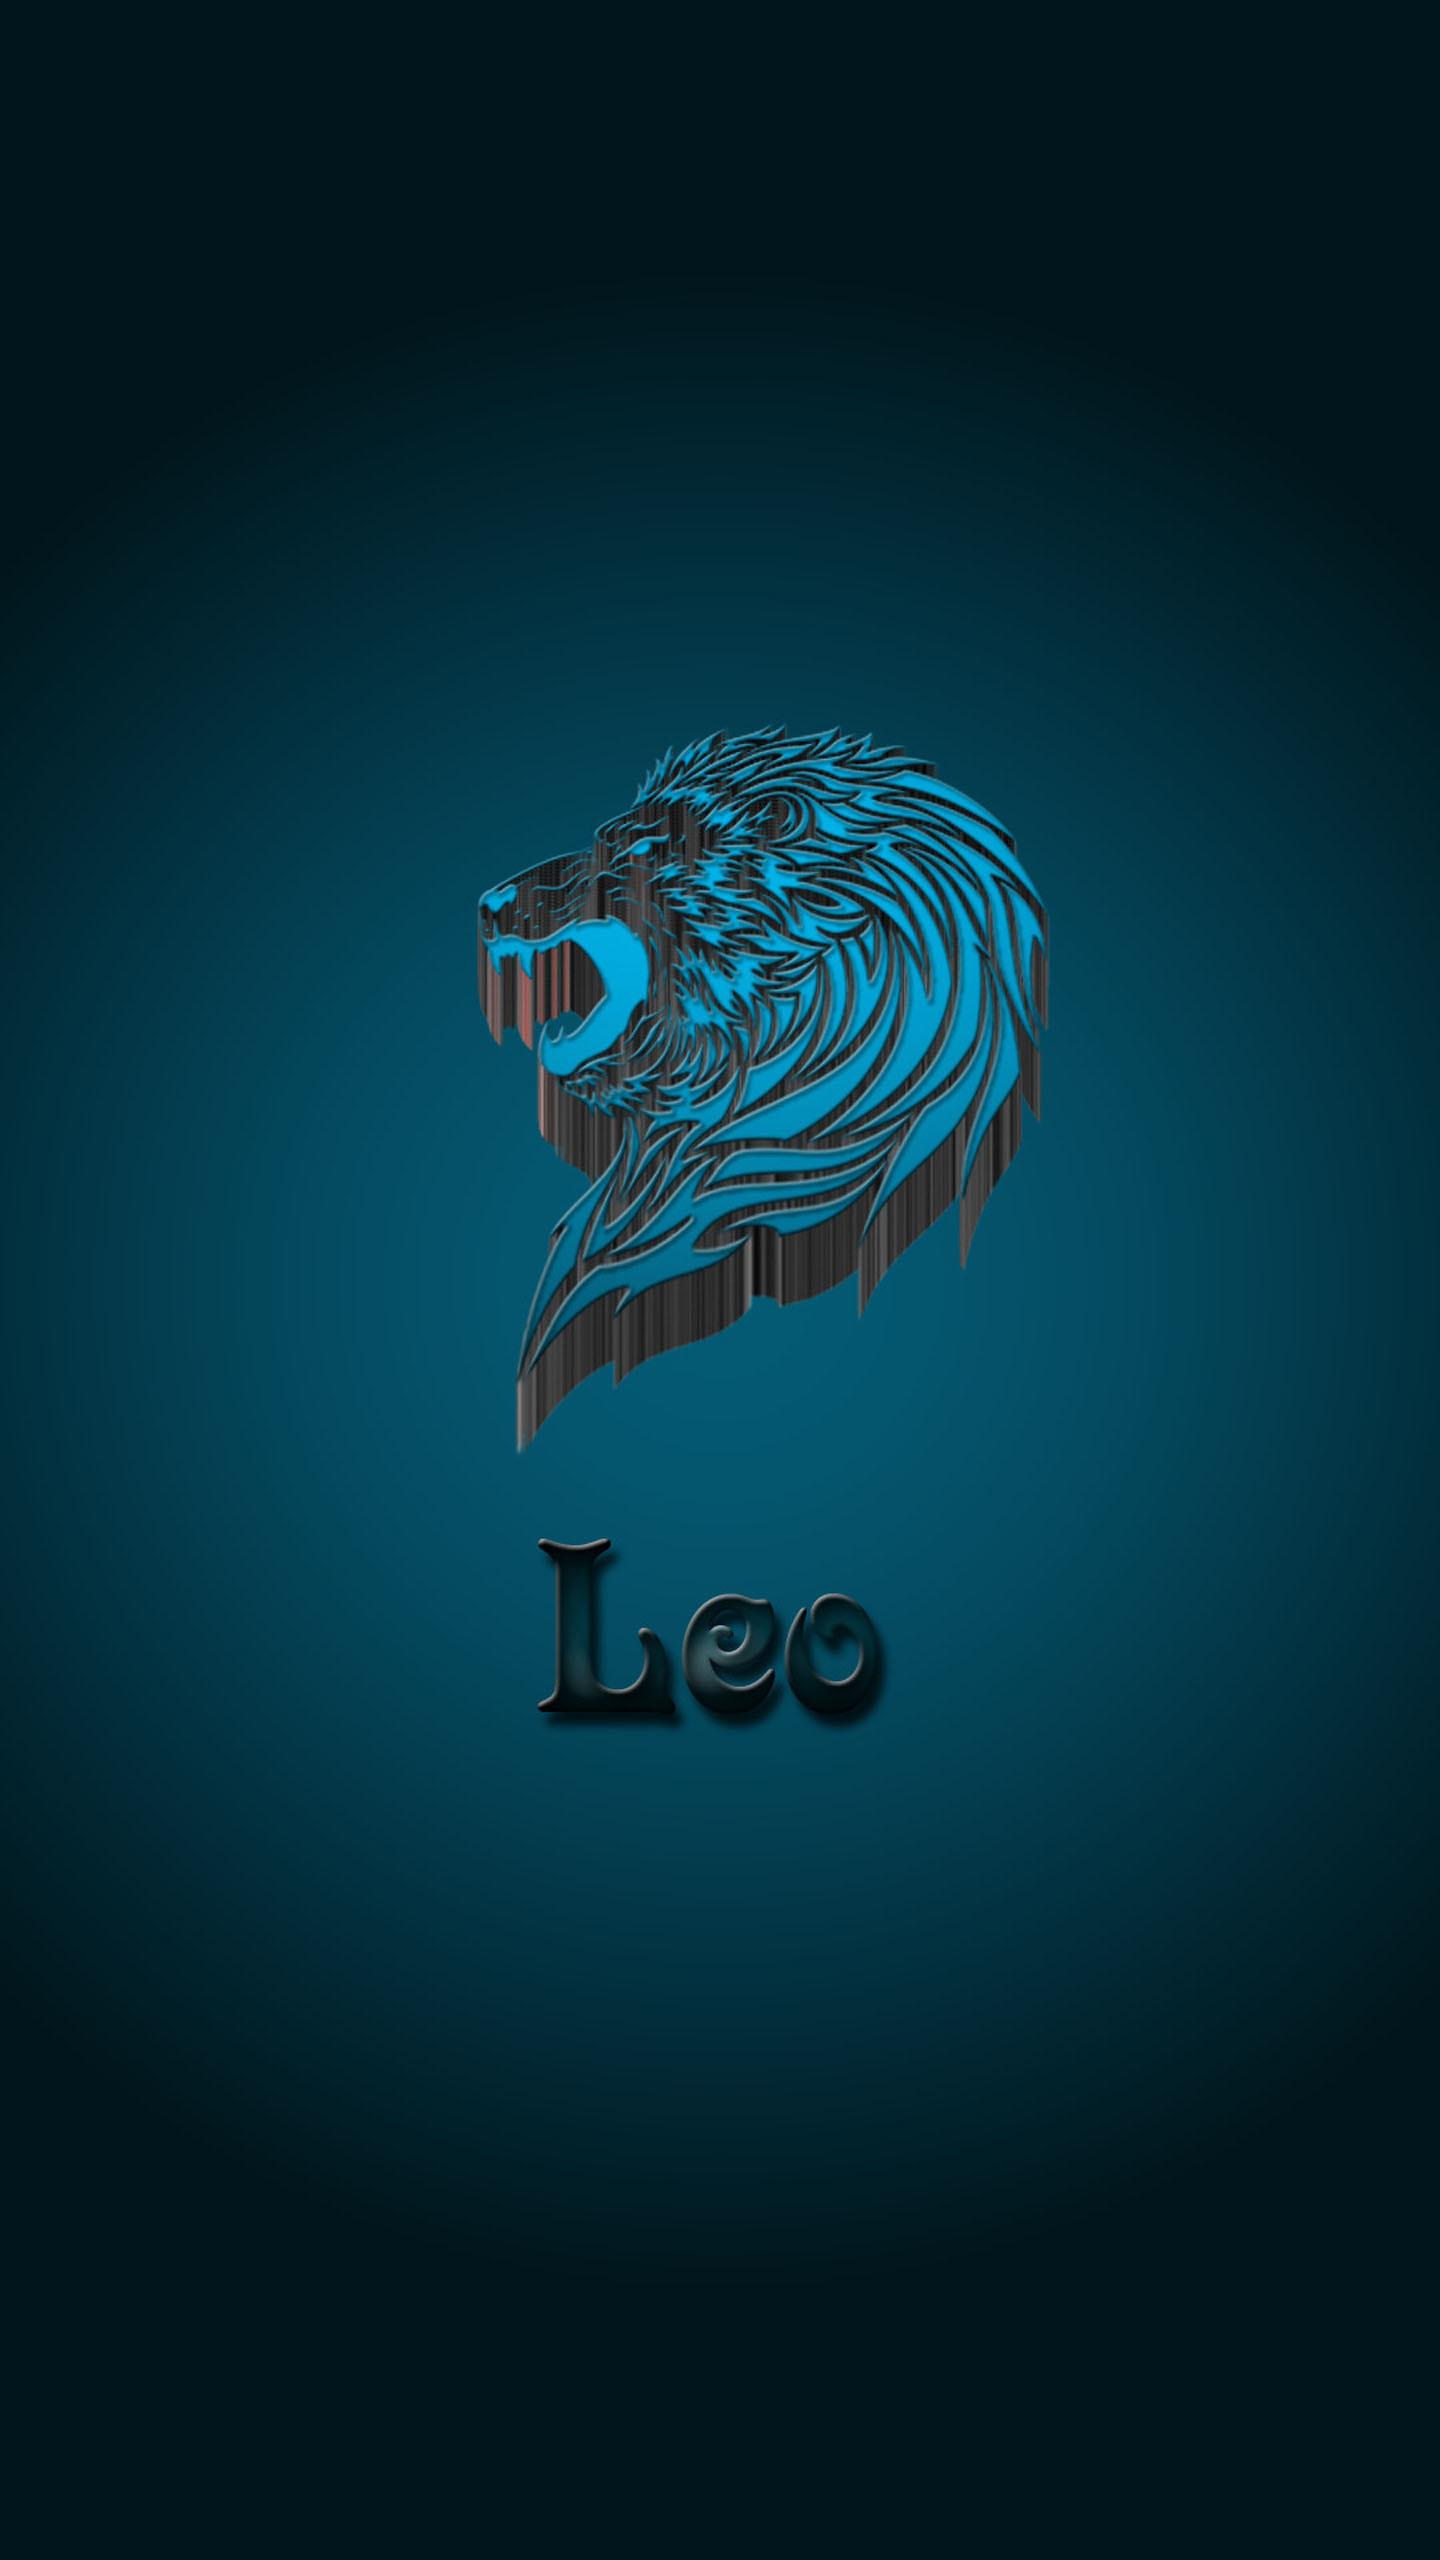 Leo Wallpaper (77+ images)